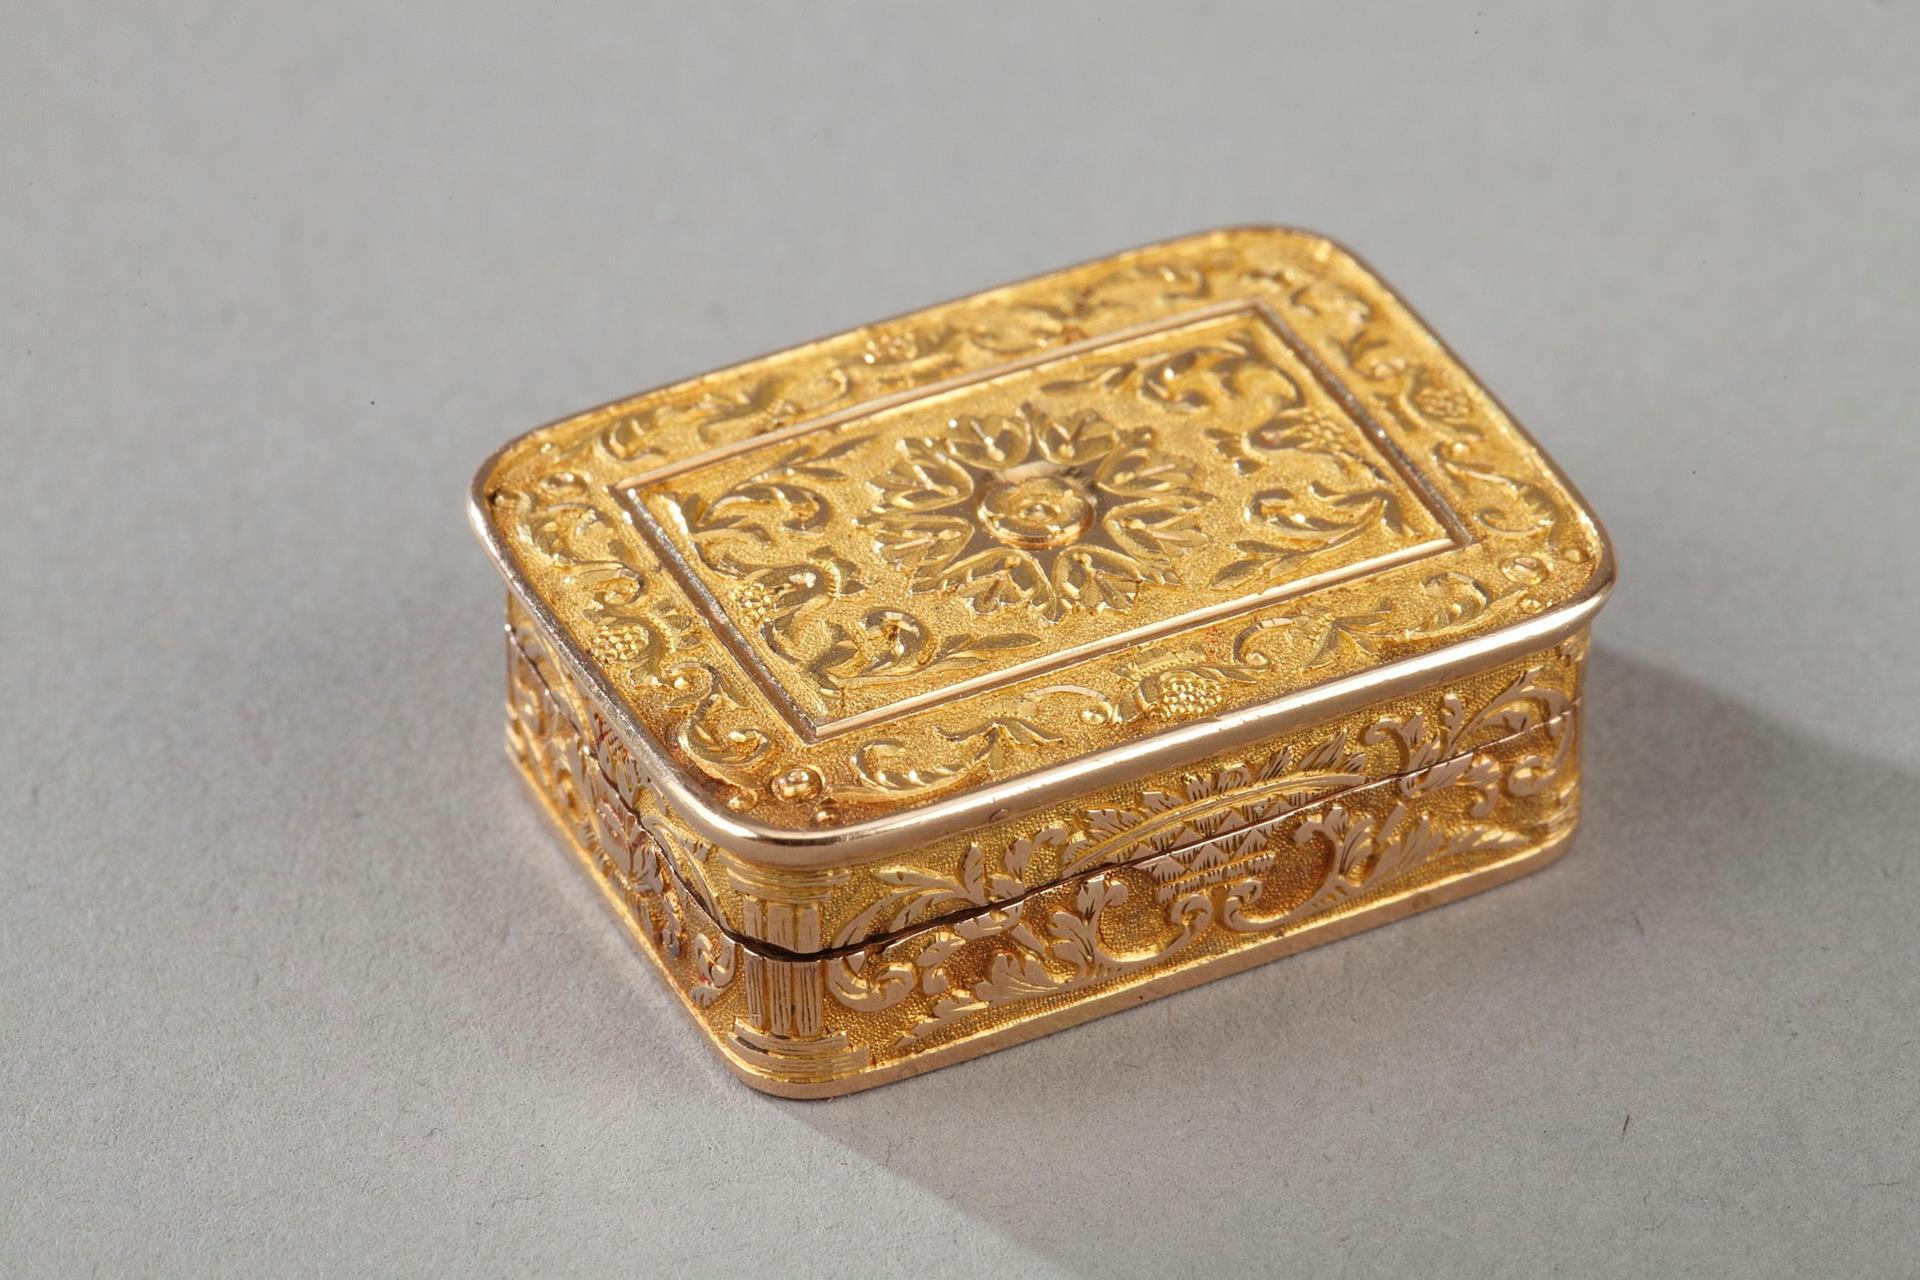 GOLD VINAIGRETTE Early 19TH CENTURY WORK